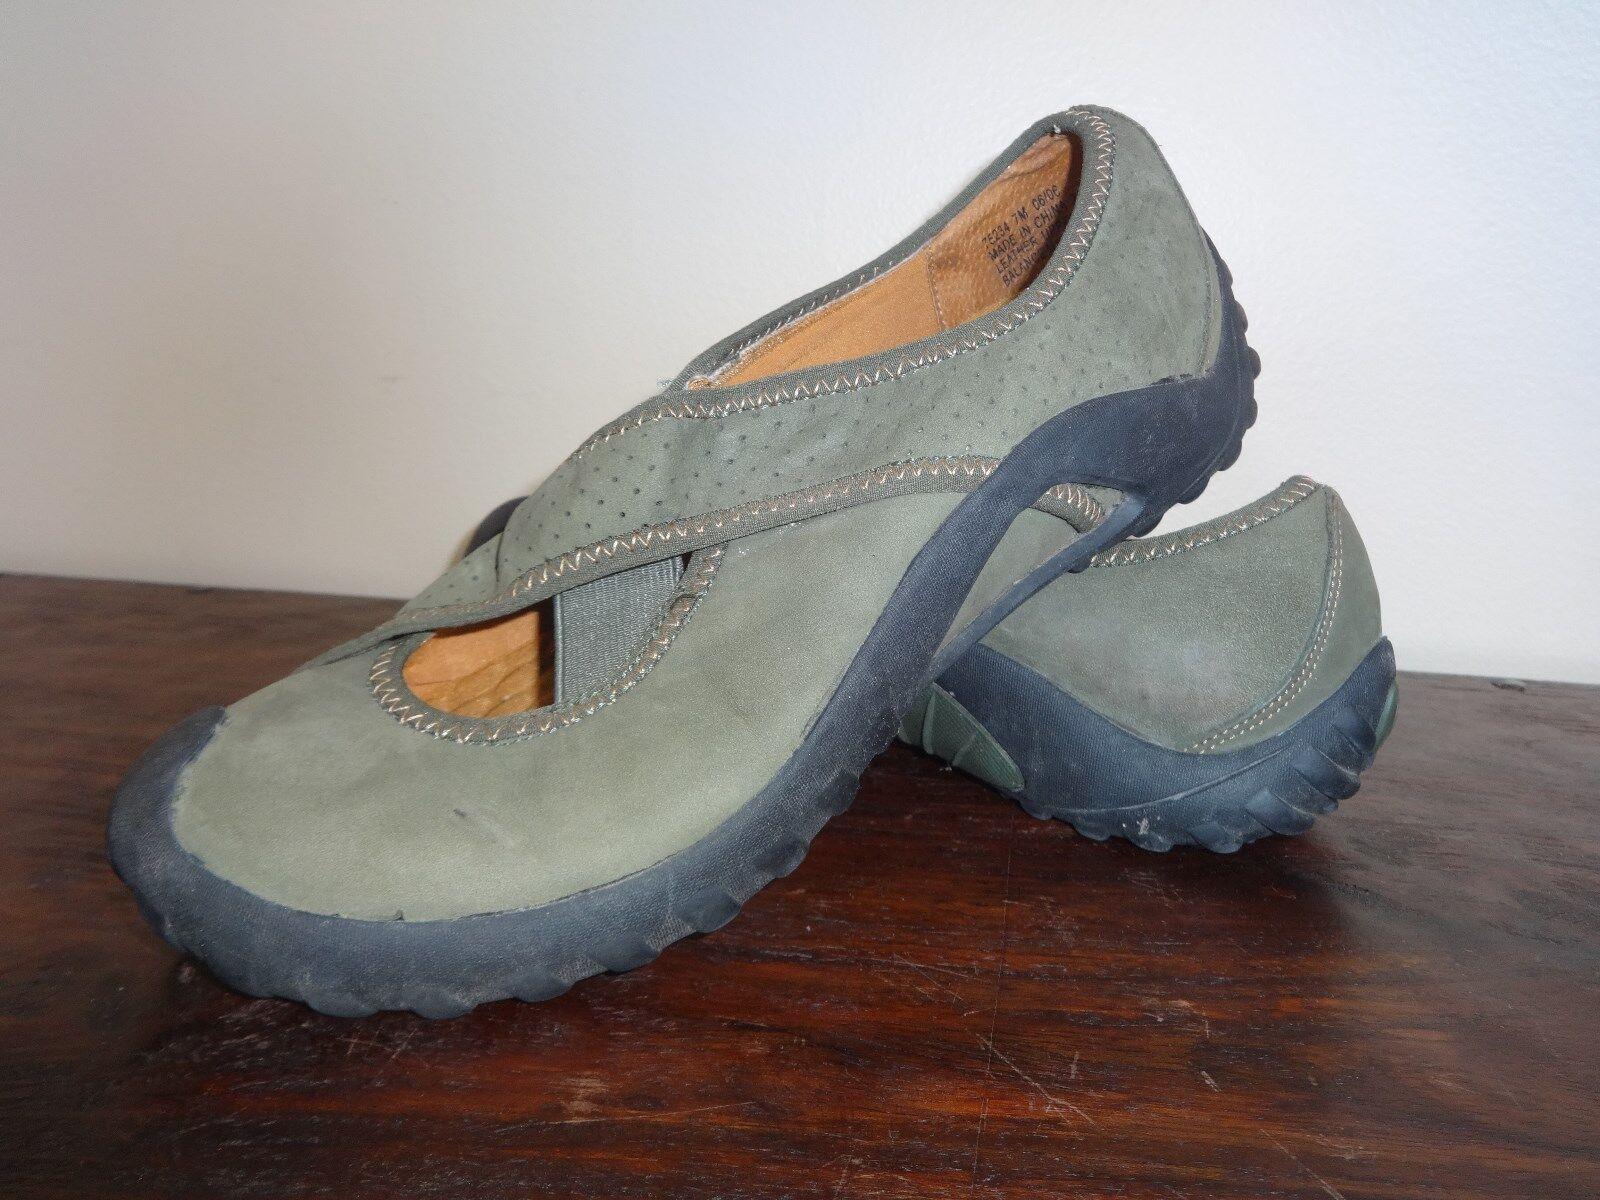 PRIVO by Clarks Women's Olive Nubuck Leather Slip-On Sport Size 7